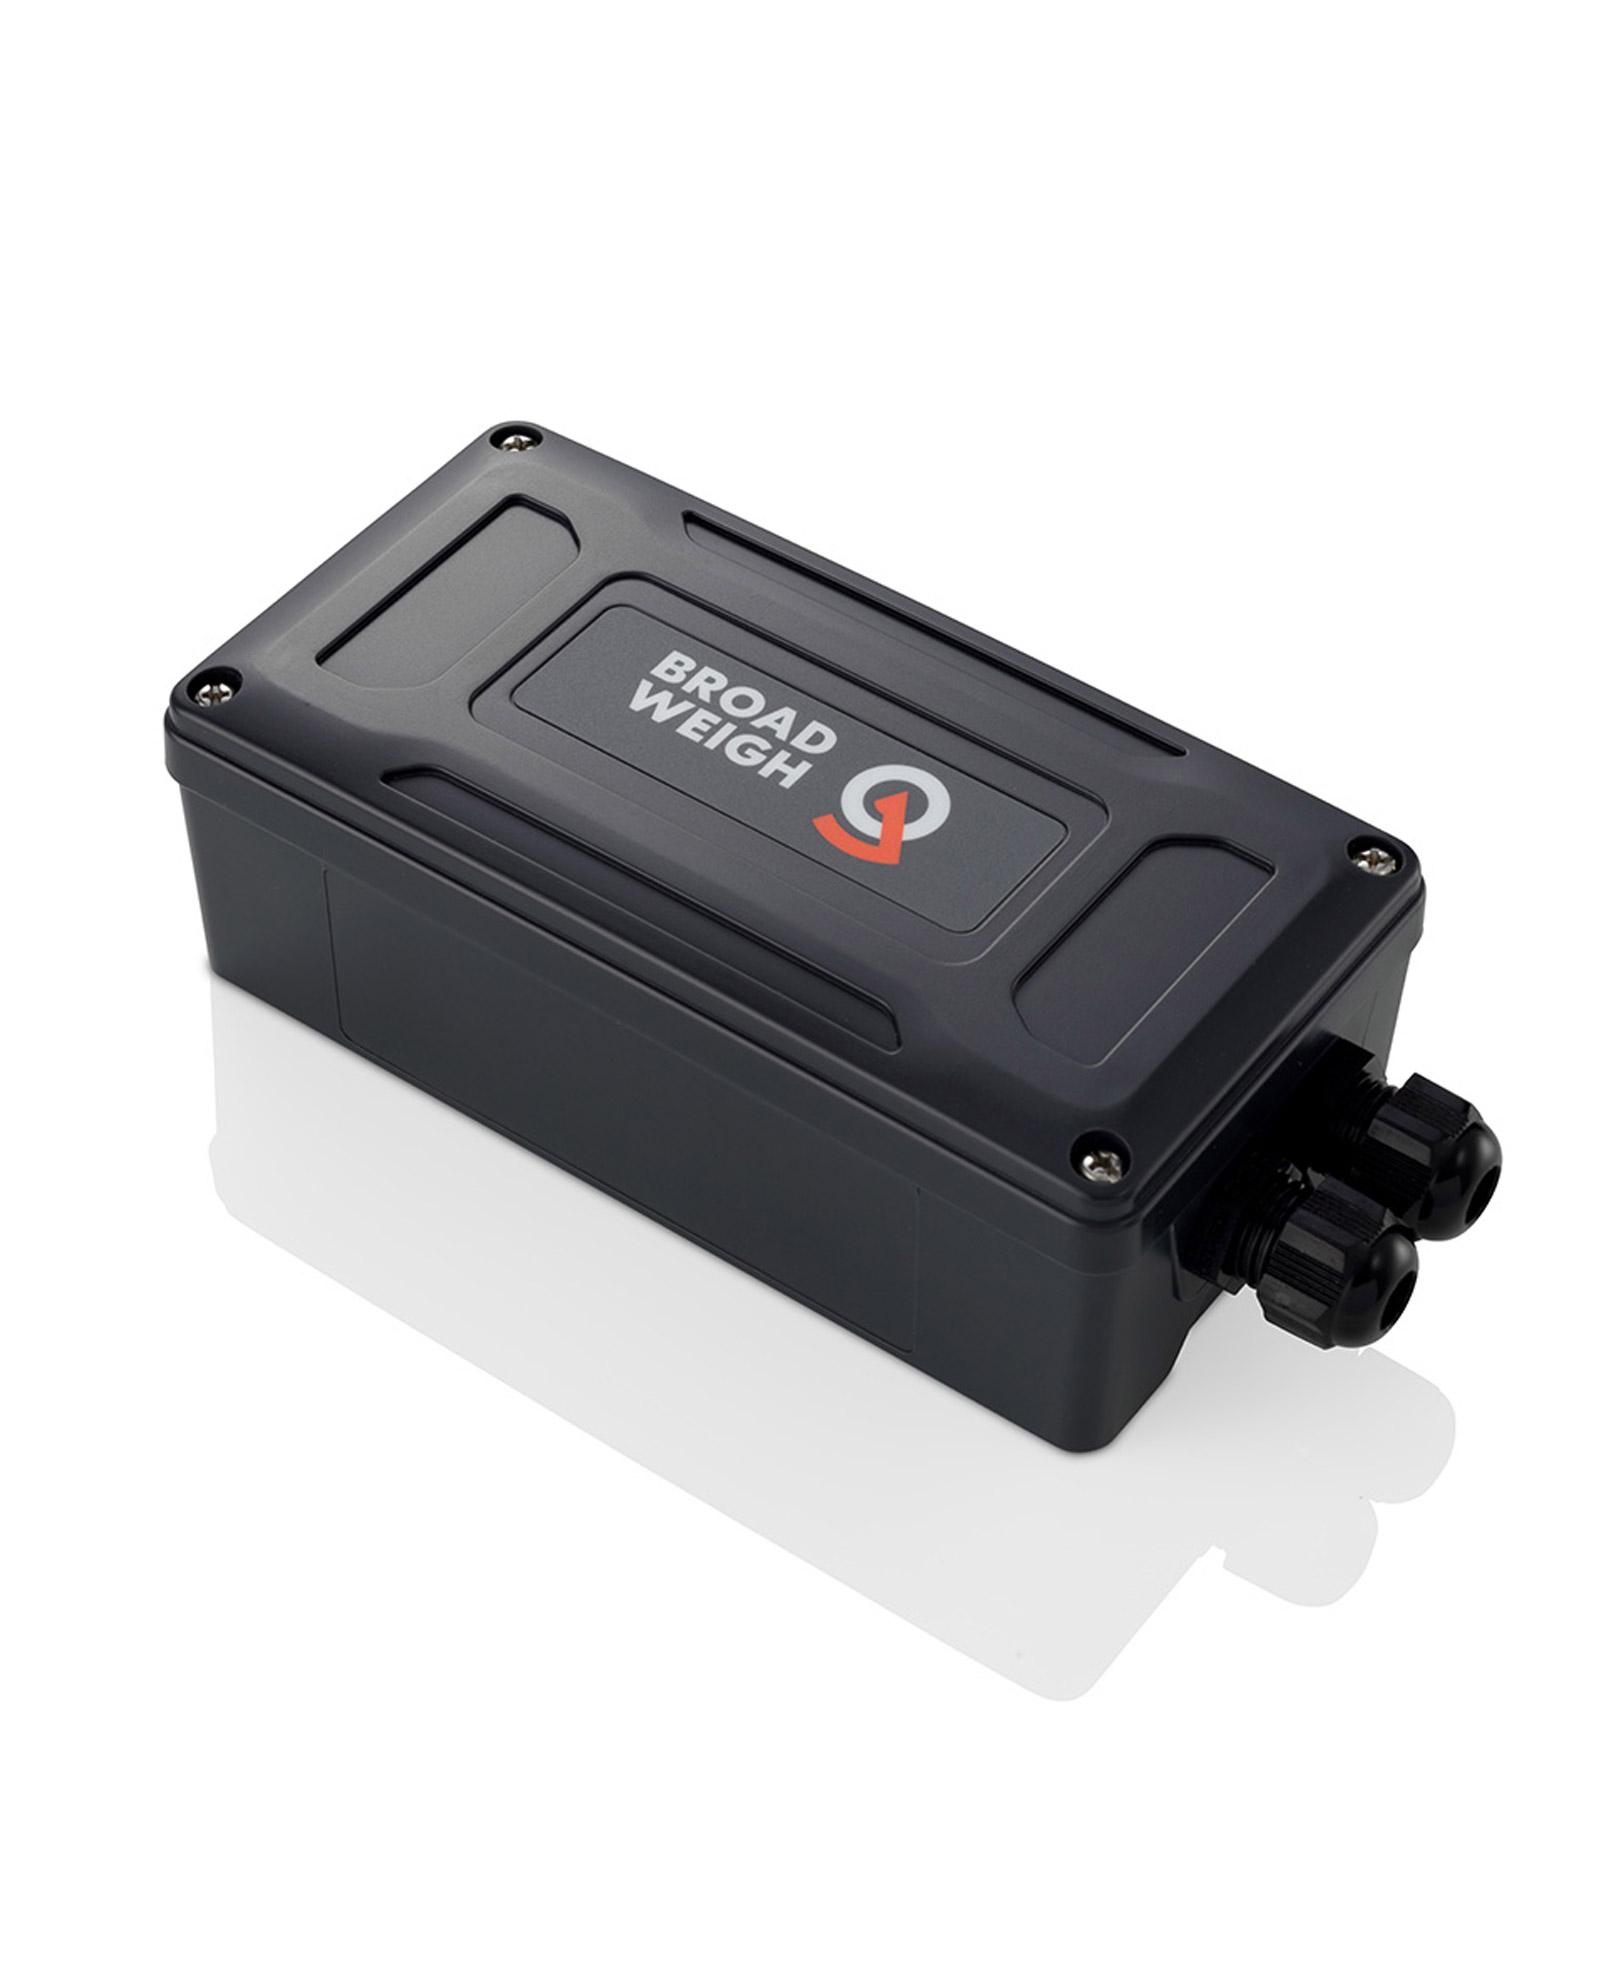 Broadweigh Bw Rm1 Wireless Relay Module